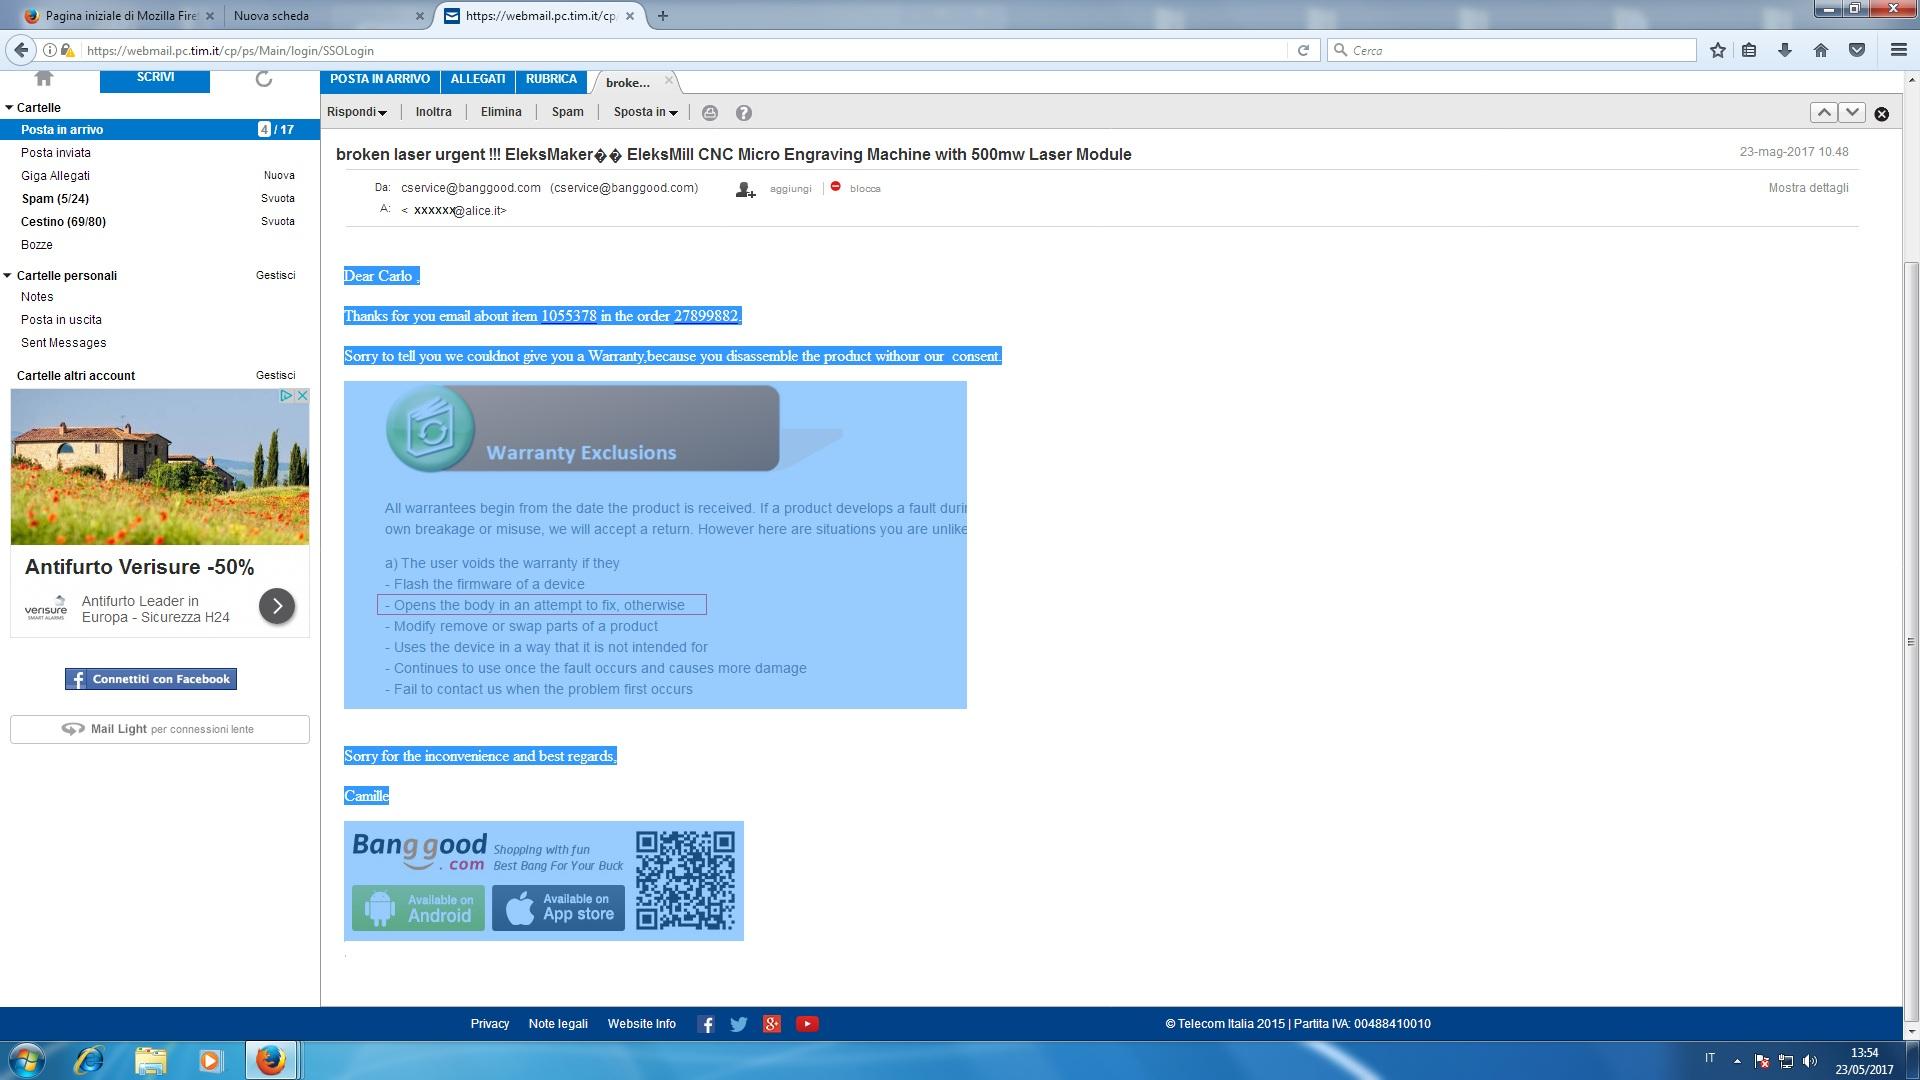 0_1495546833820_mail.jpg